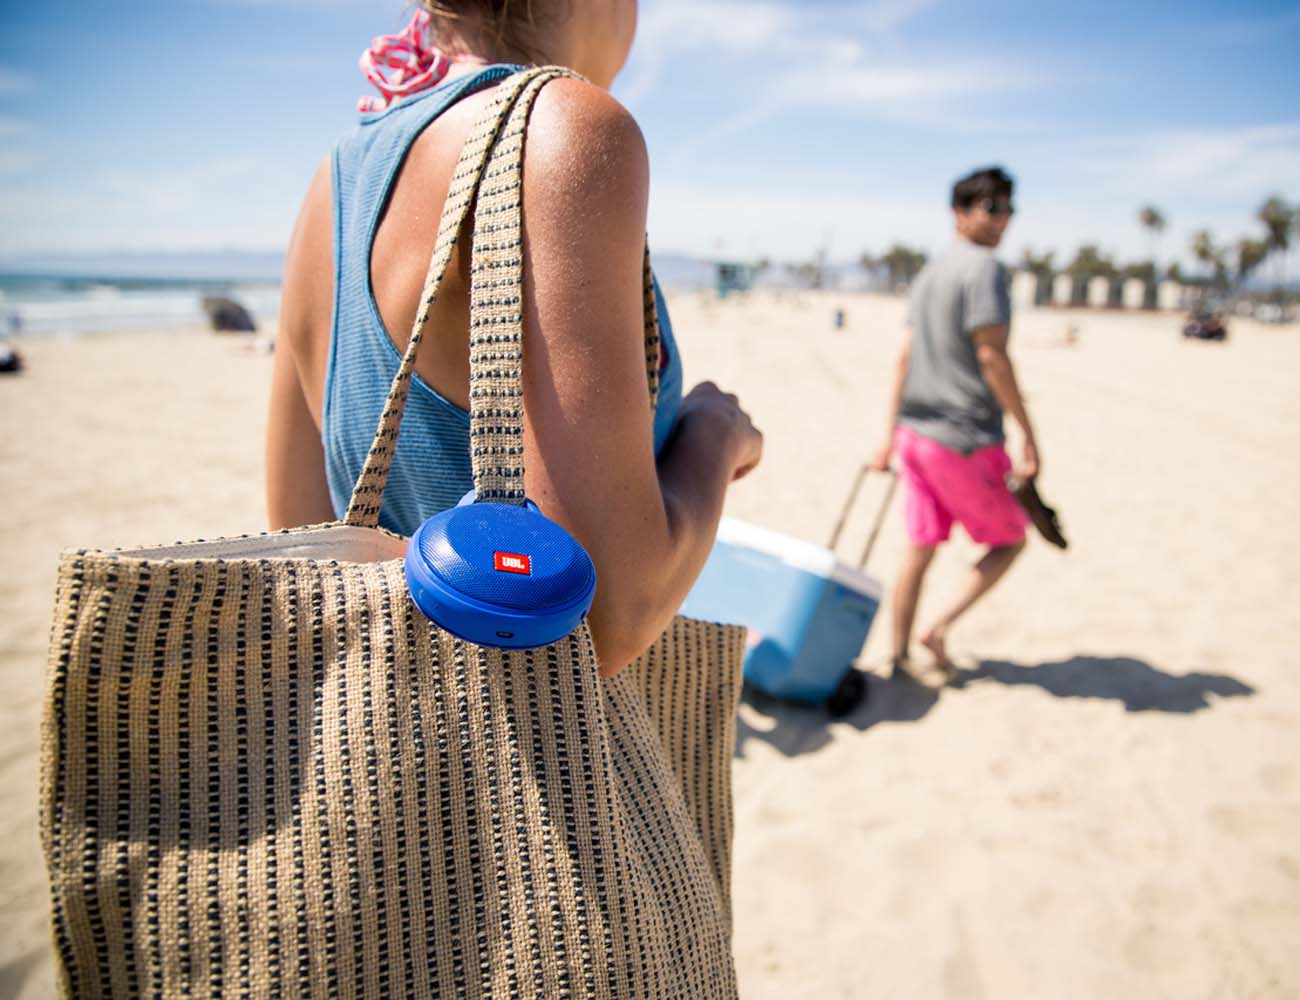 Clip+ – Splashproof Portable Bluetooth Speaker by JBL